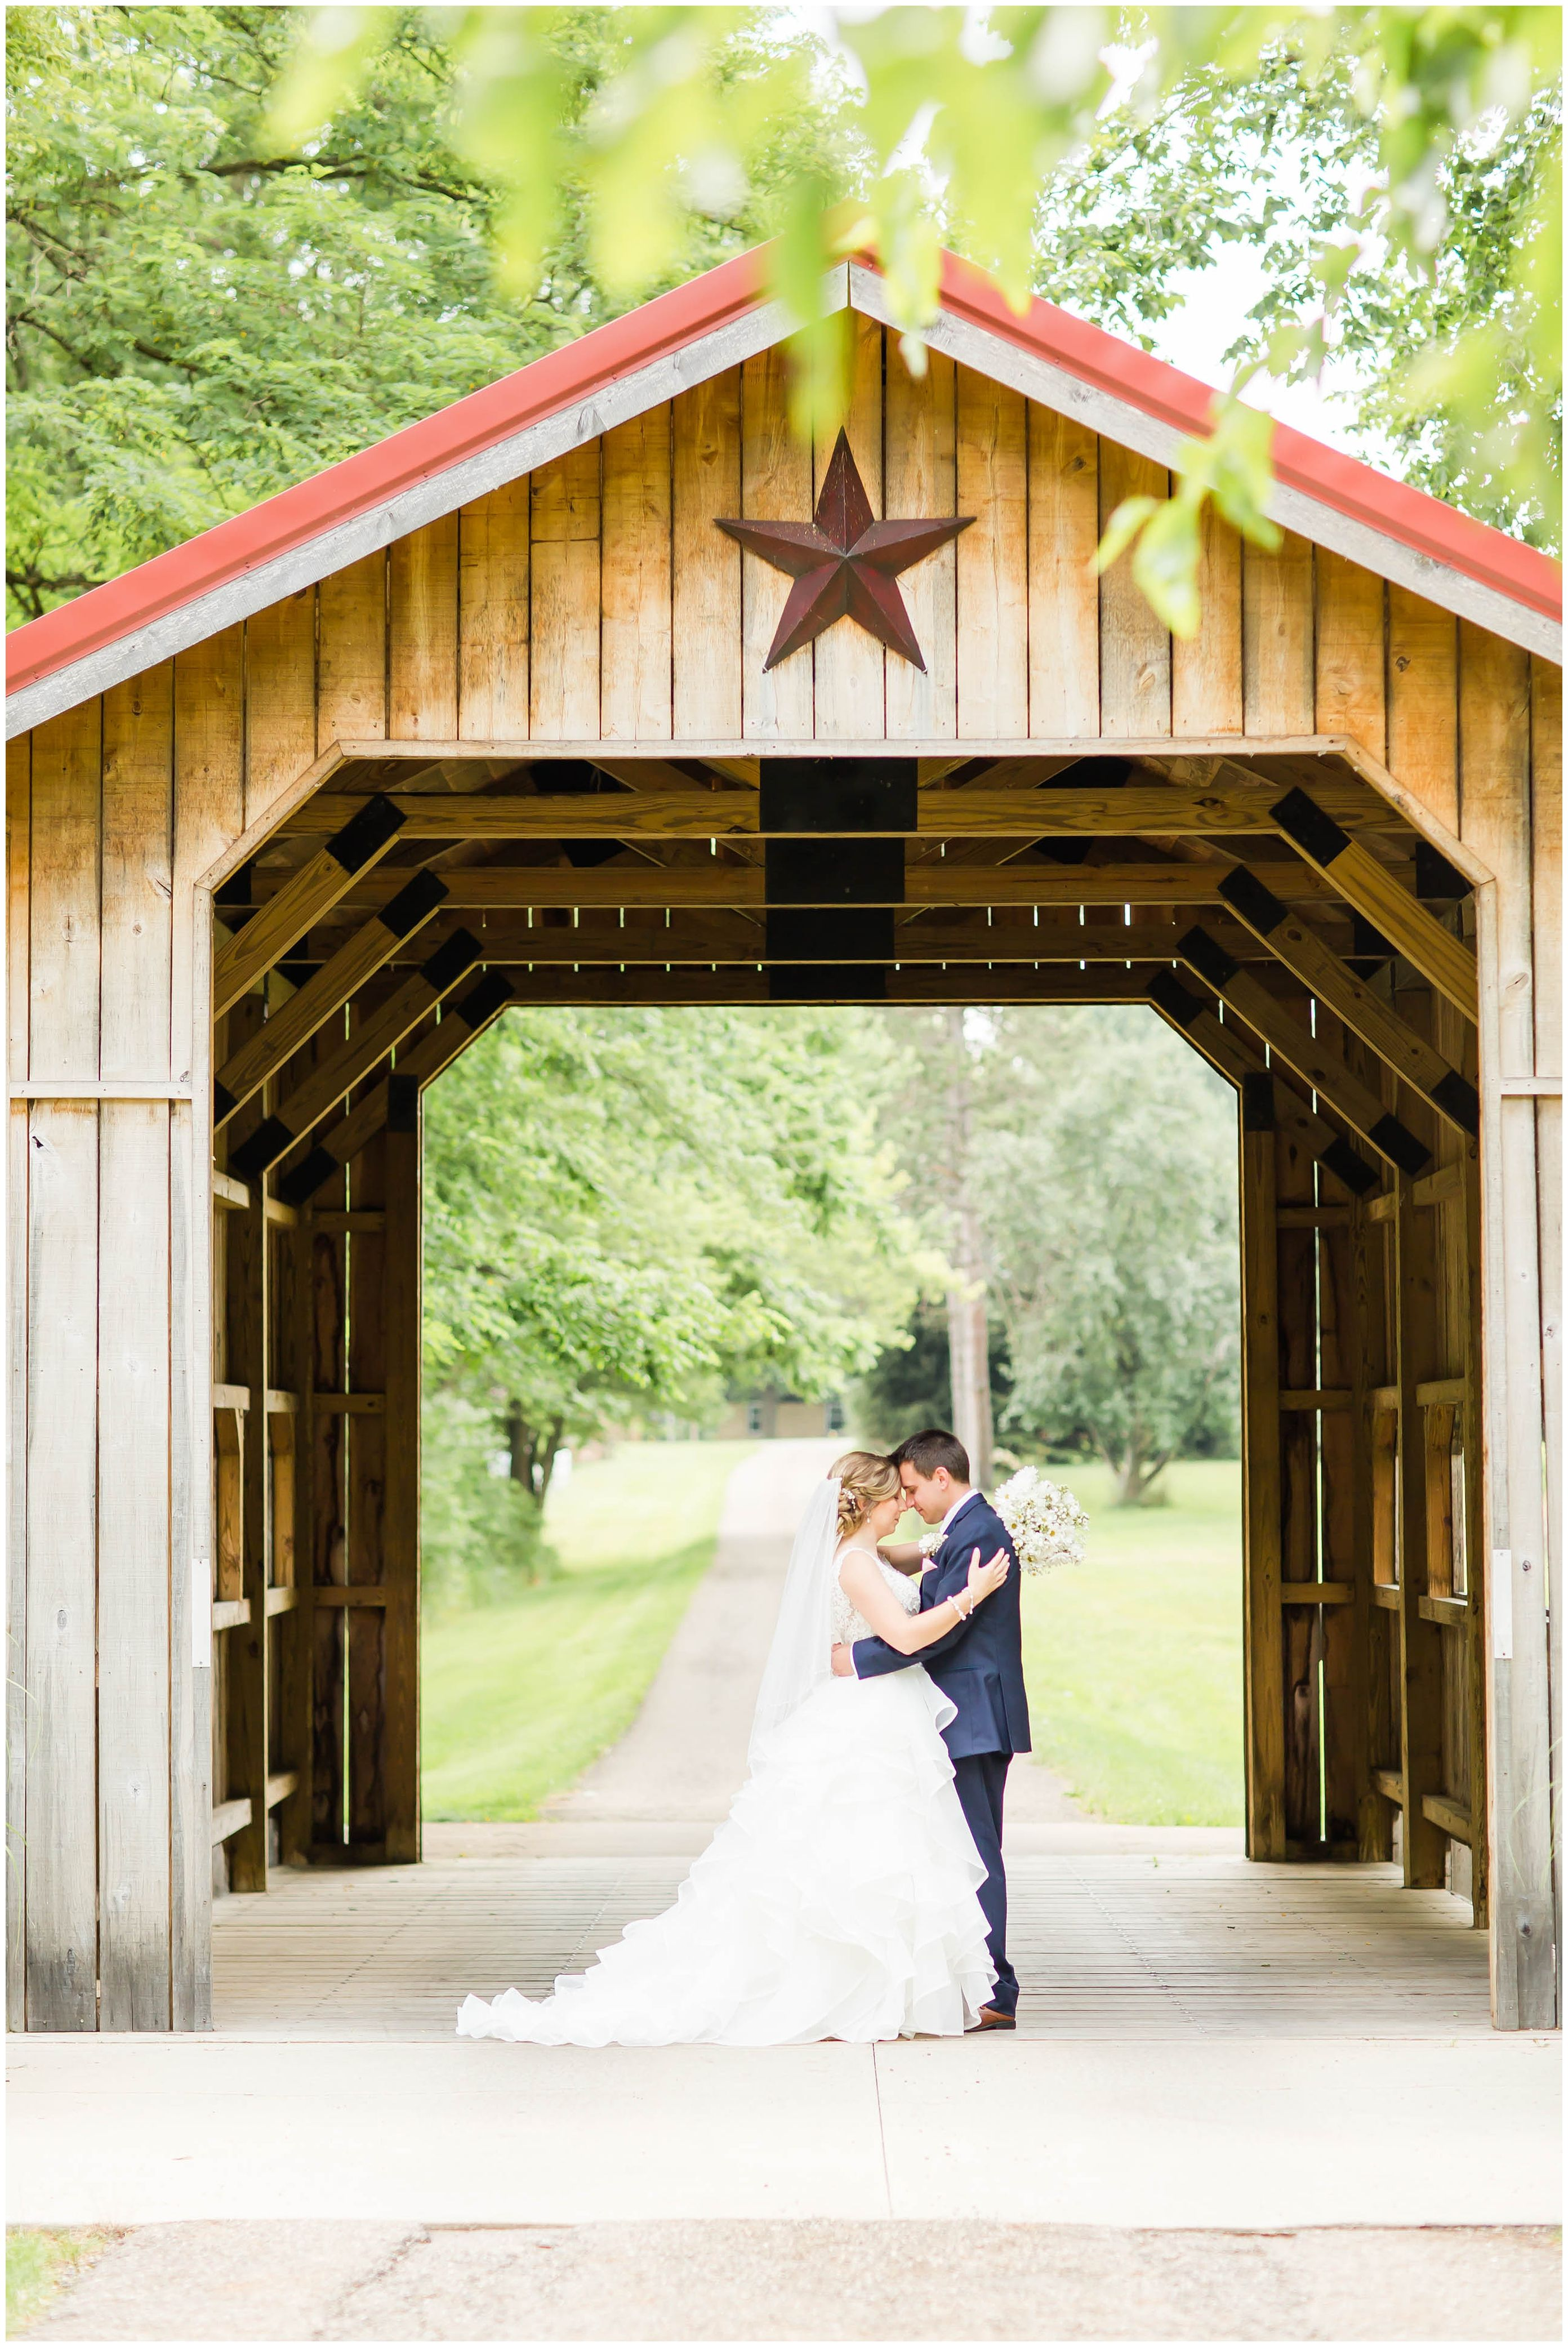 Brookside Farm Summer Wedding   Rustic wedding venues ...